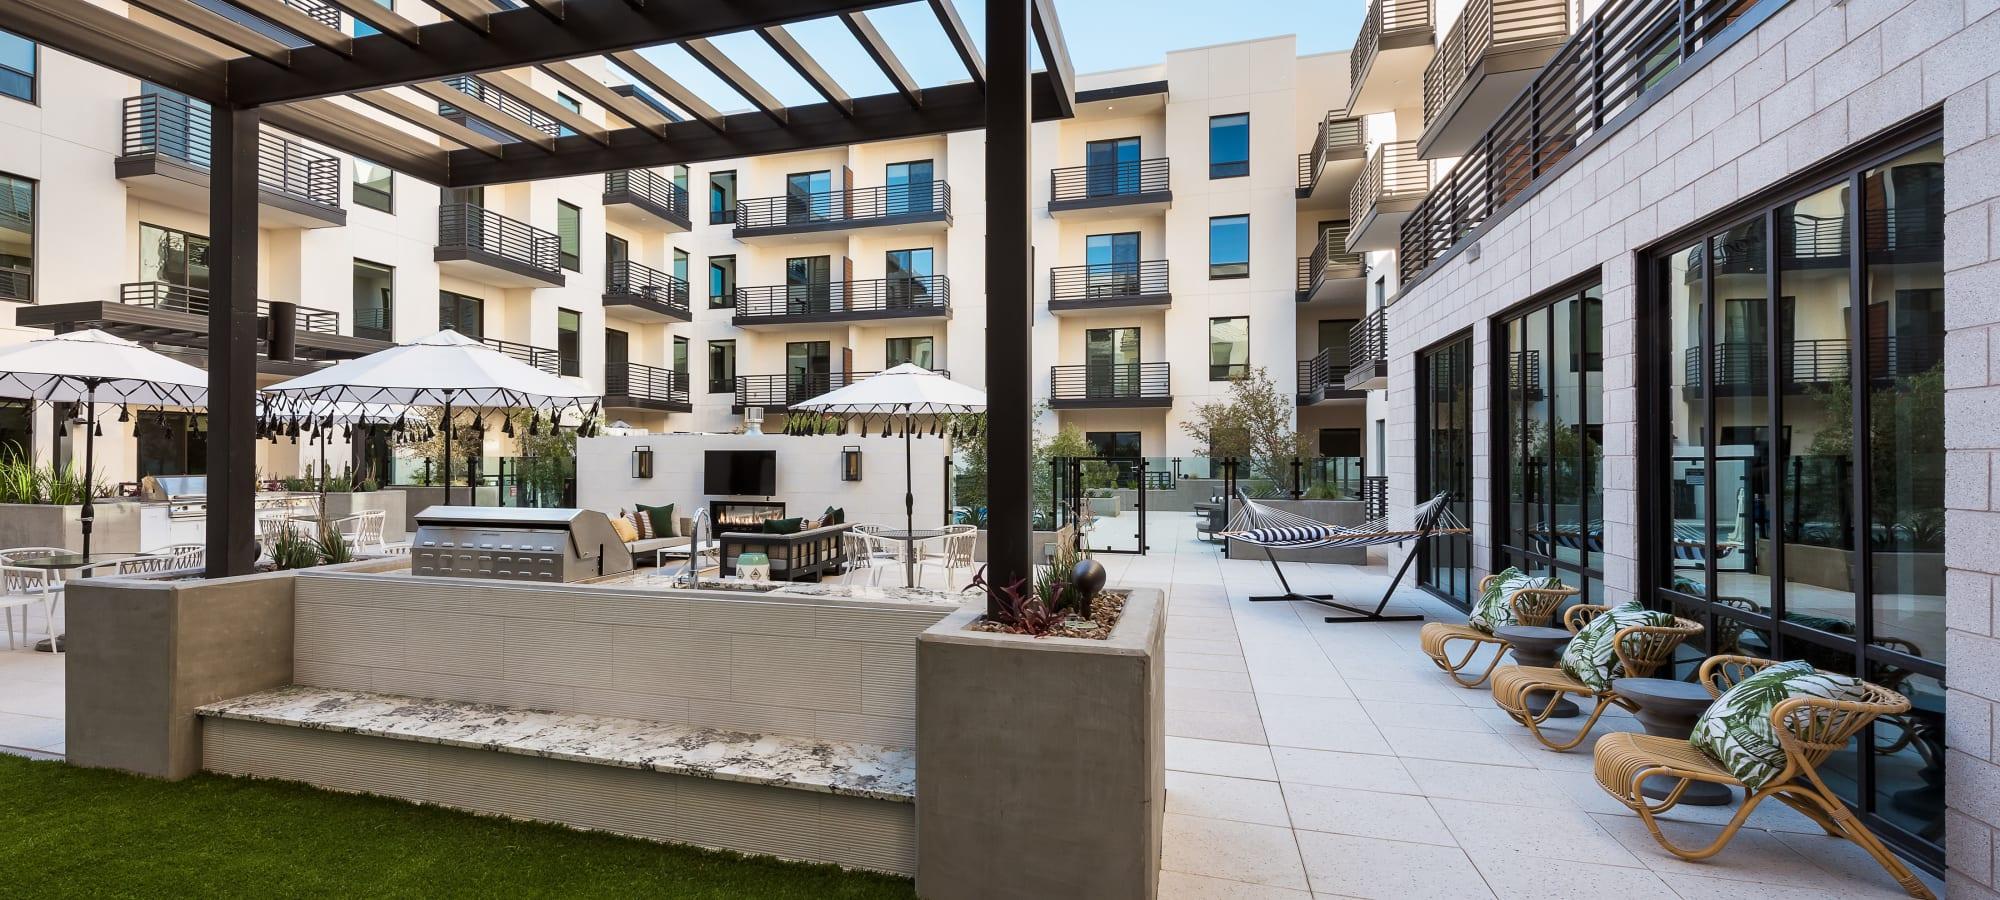 Spacious outdoor area at Gramercy Scottsdale in Scottsdale, Arizona